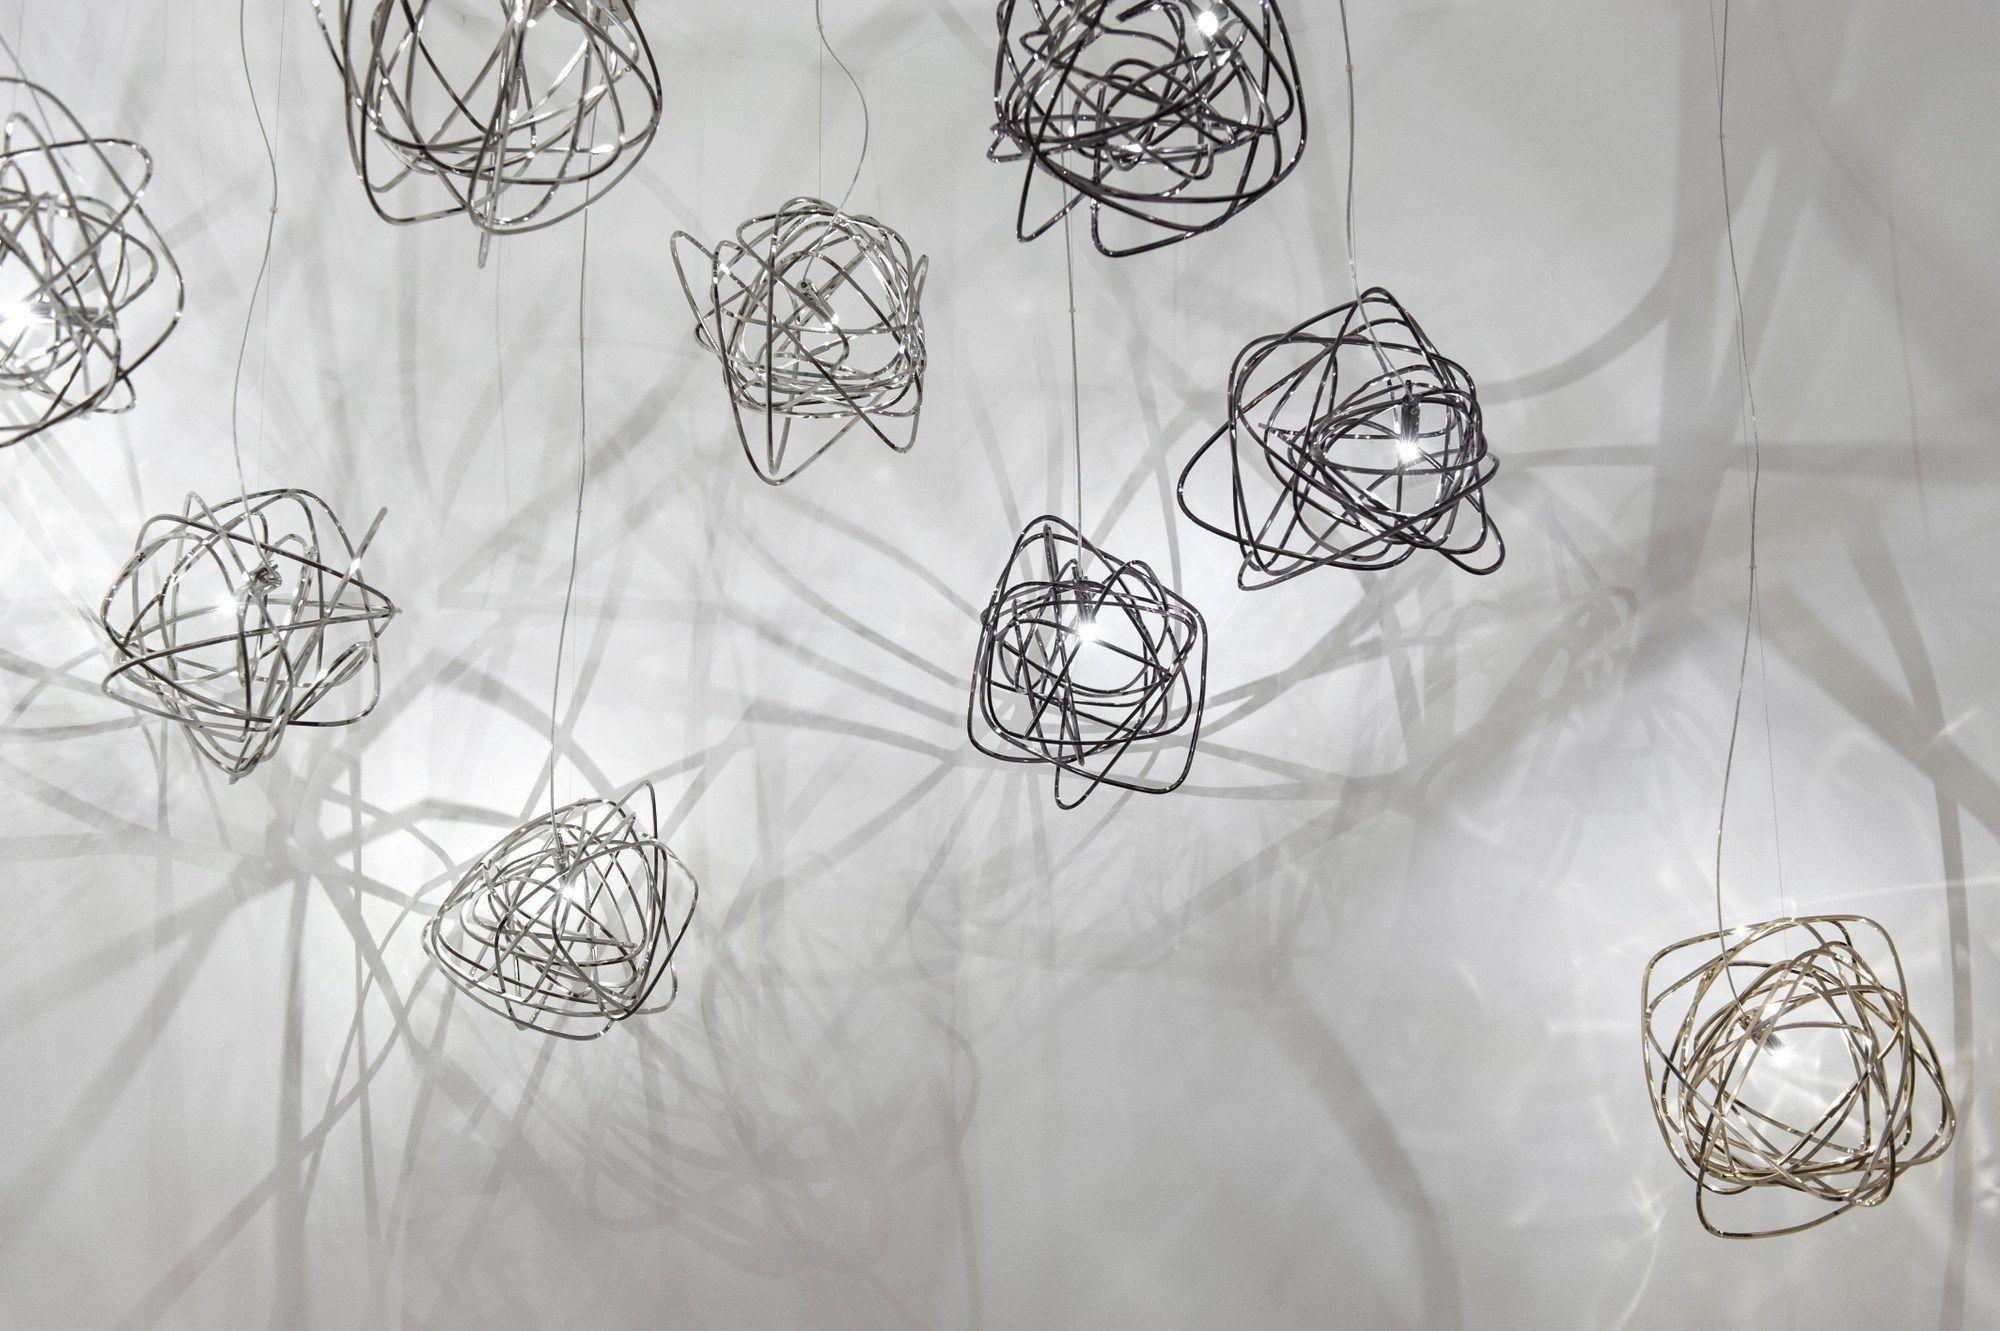 doodle-terzani-190500-rel653812b.jpg